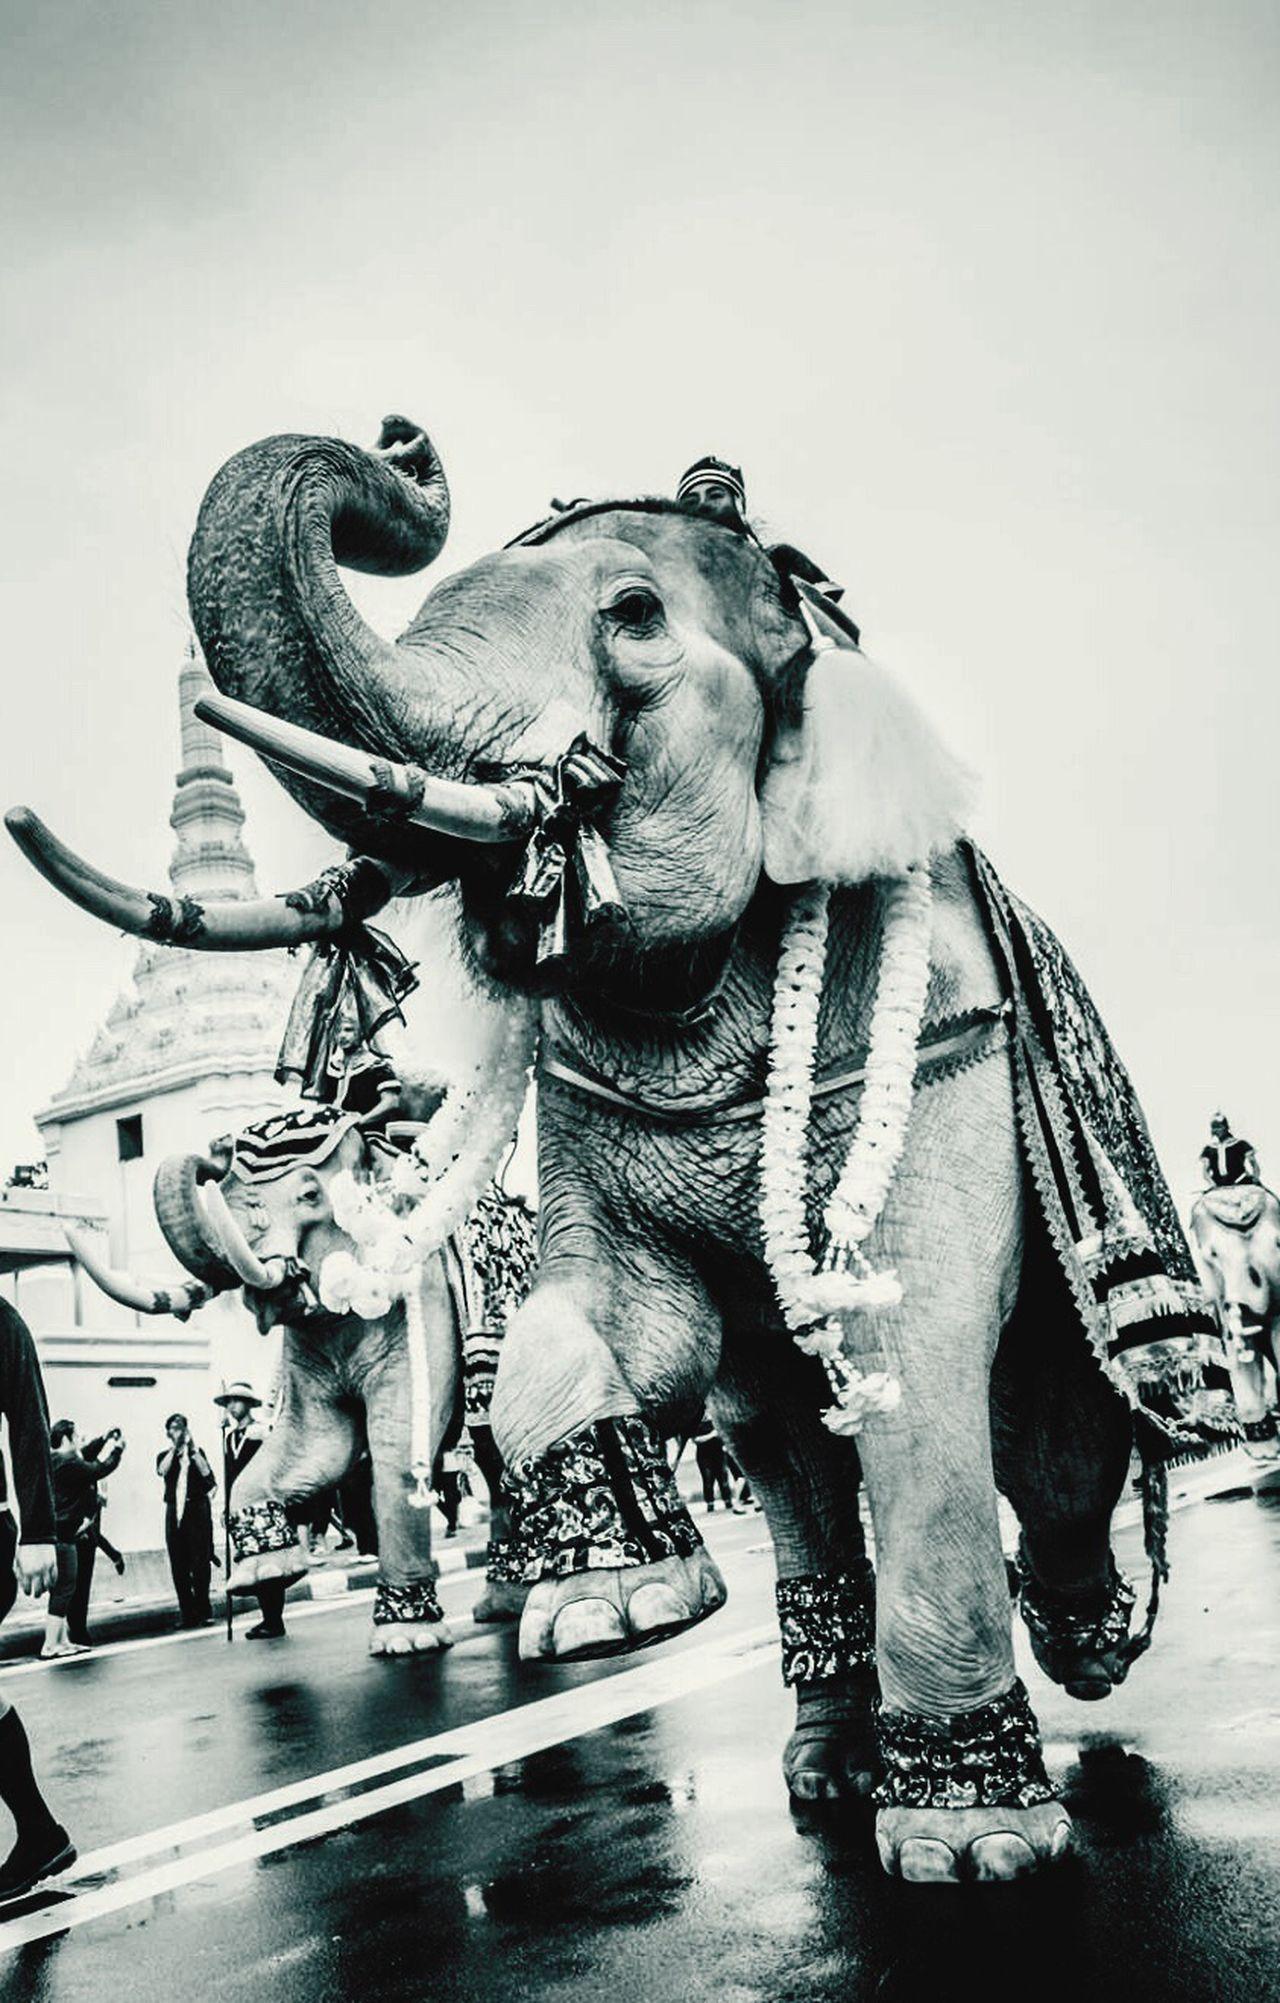 Snap A Stranger Elephant Men Asian Elephant No People Thailand Grand Palace Bangkok Thailand Rama9 KingOfKings Day